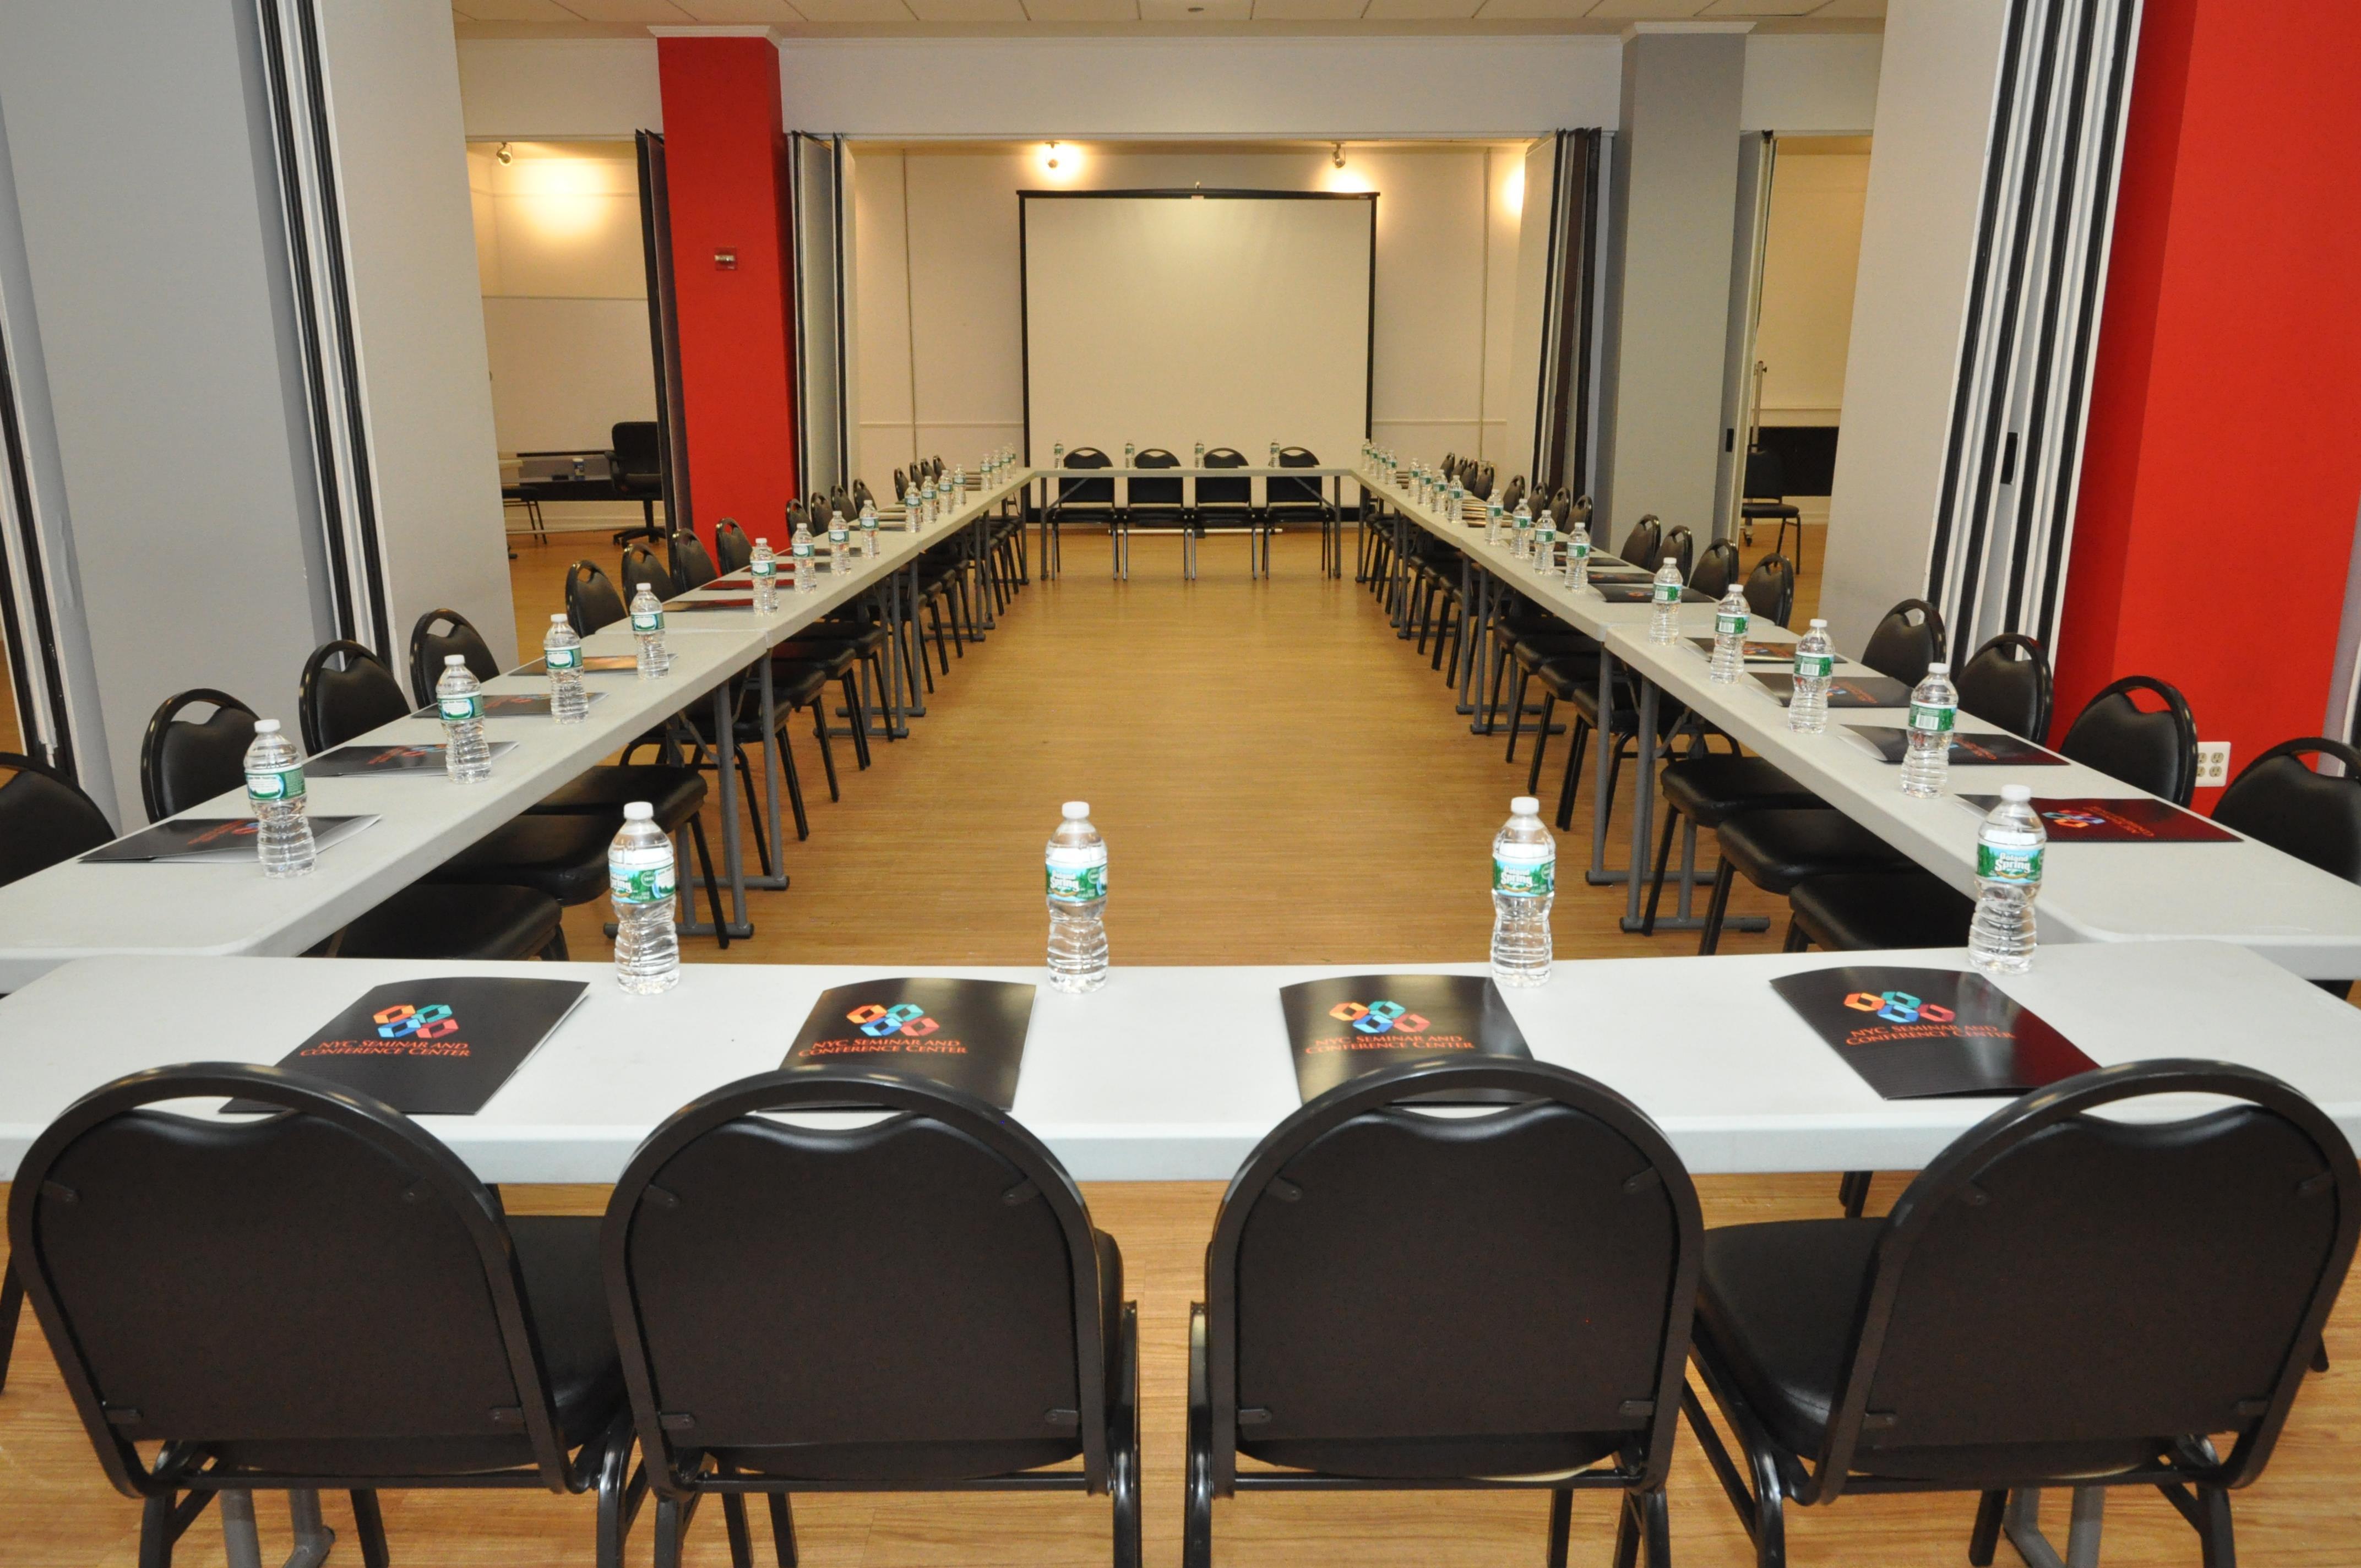 NYC Seminar & Conference Center - Flatiron Event Hall